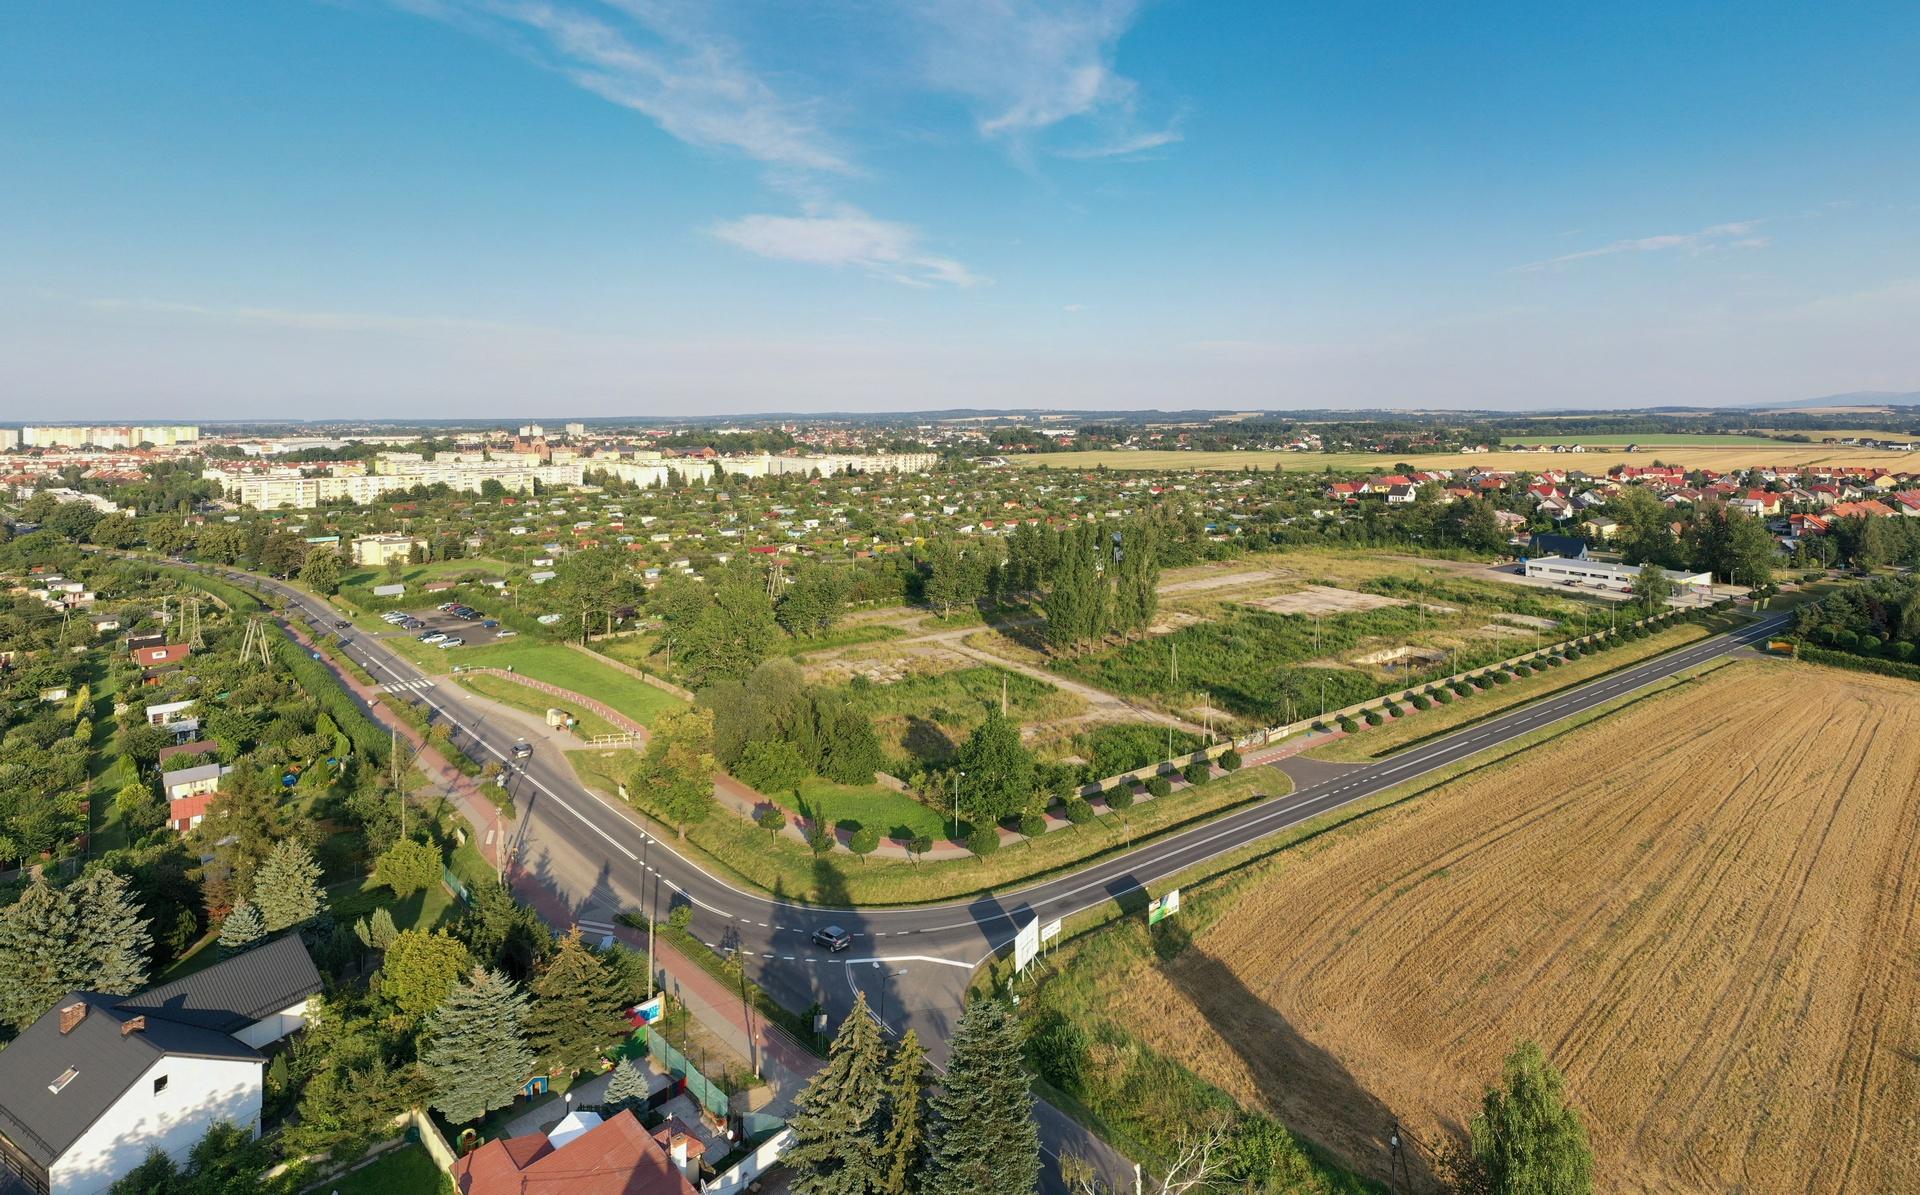 Belweder Park Nysa-Zdjecia z Drona 20.02.2020 10